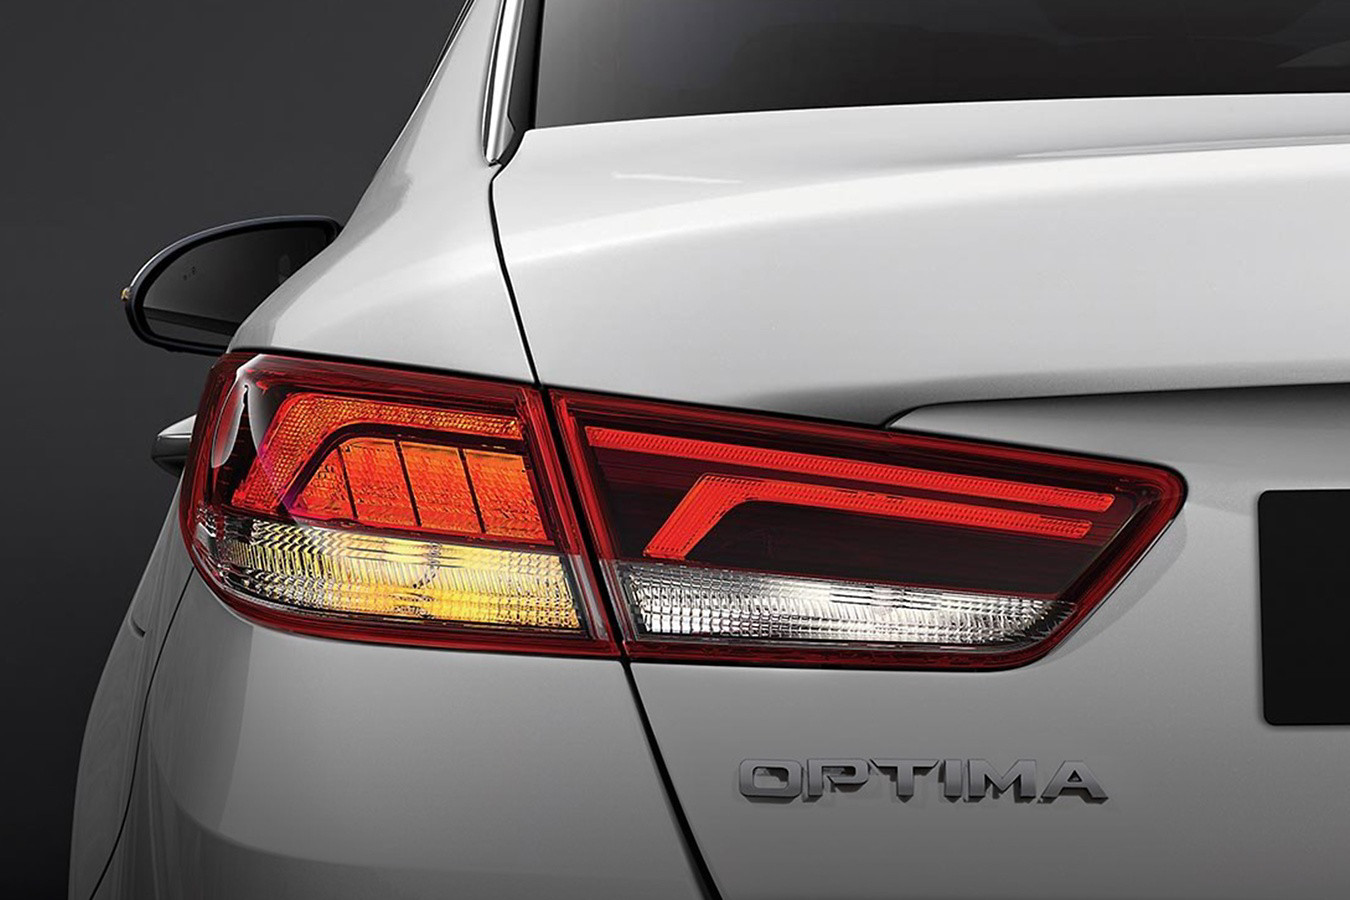 Stunning Exterior of the 2020 Kia Optima